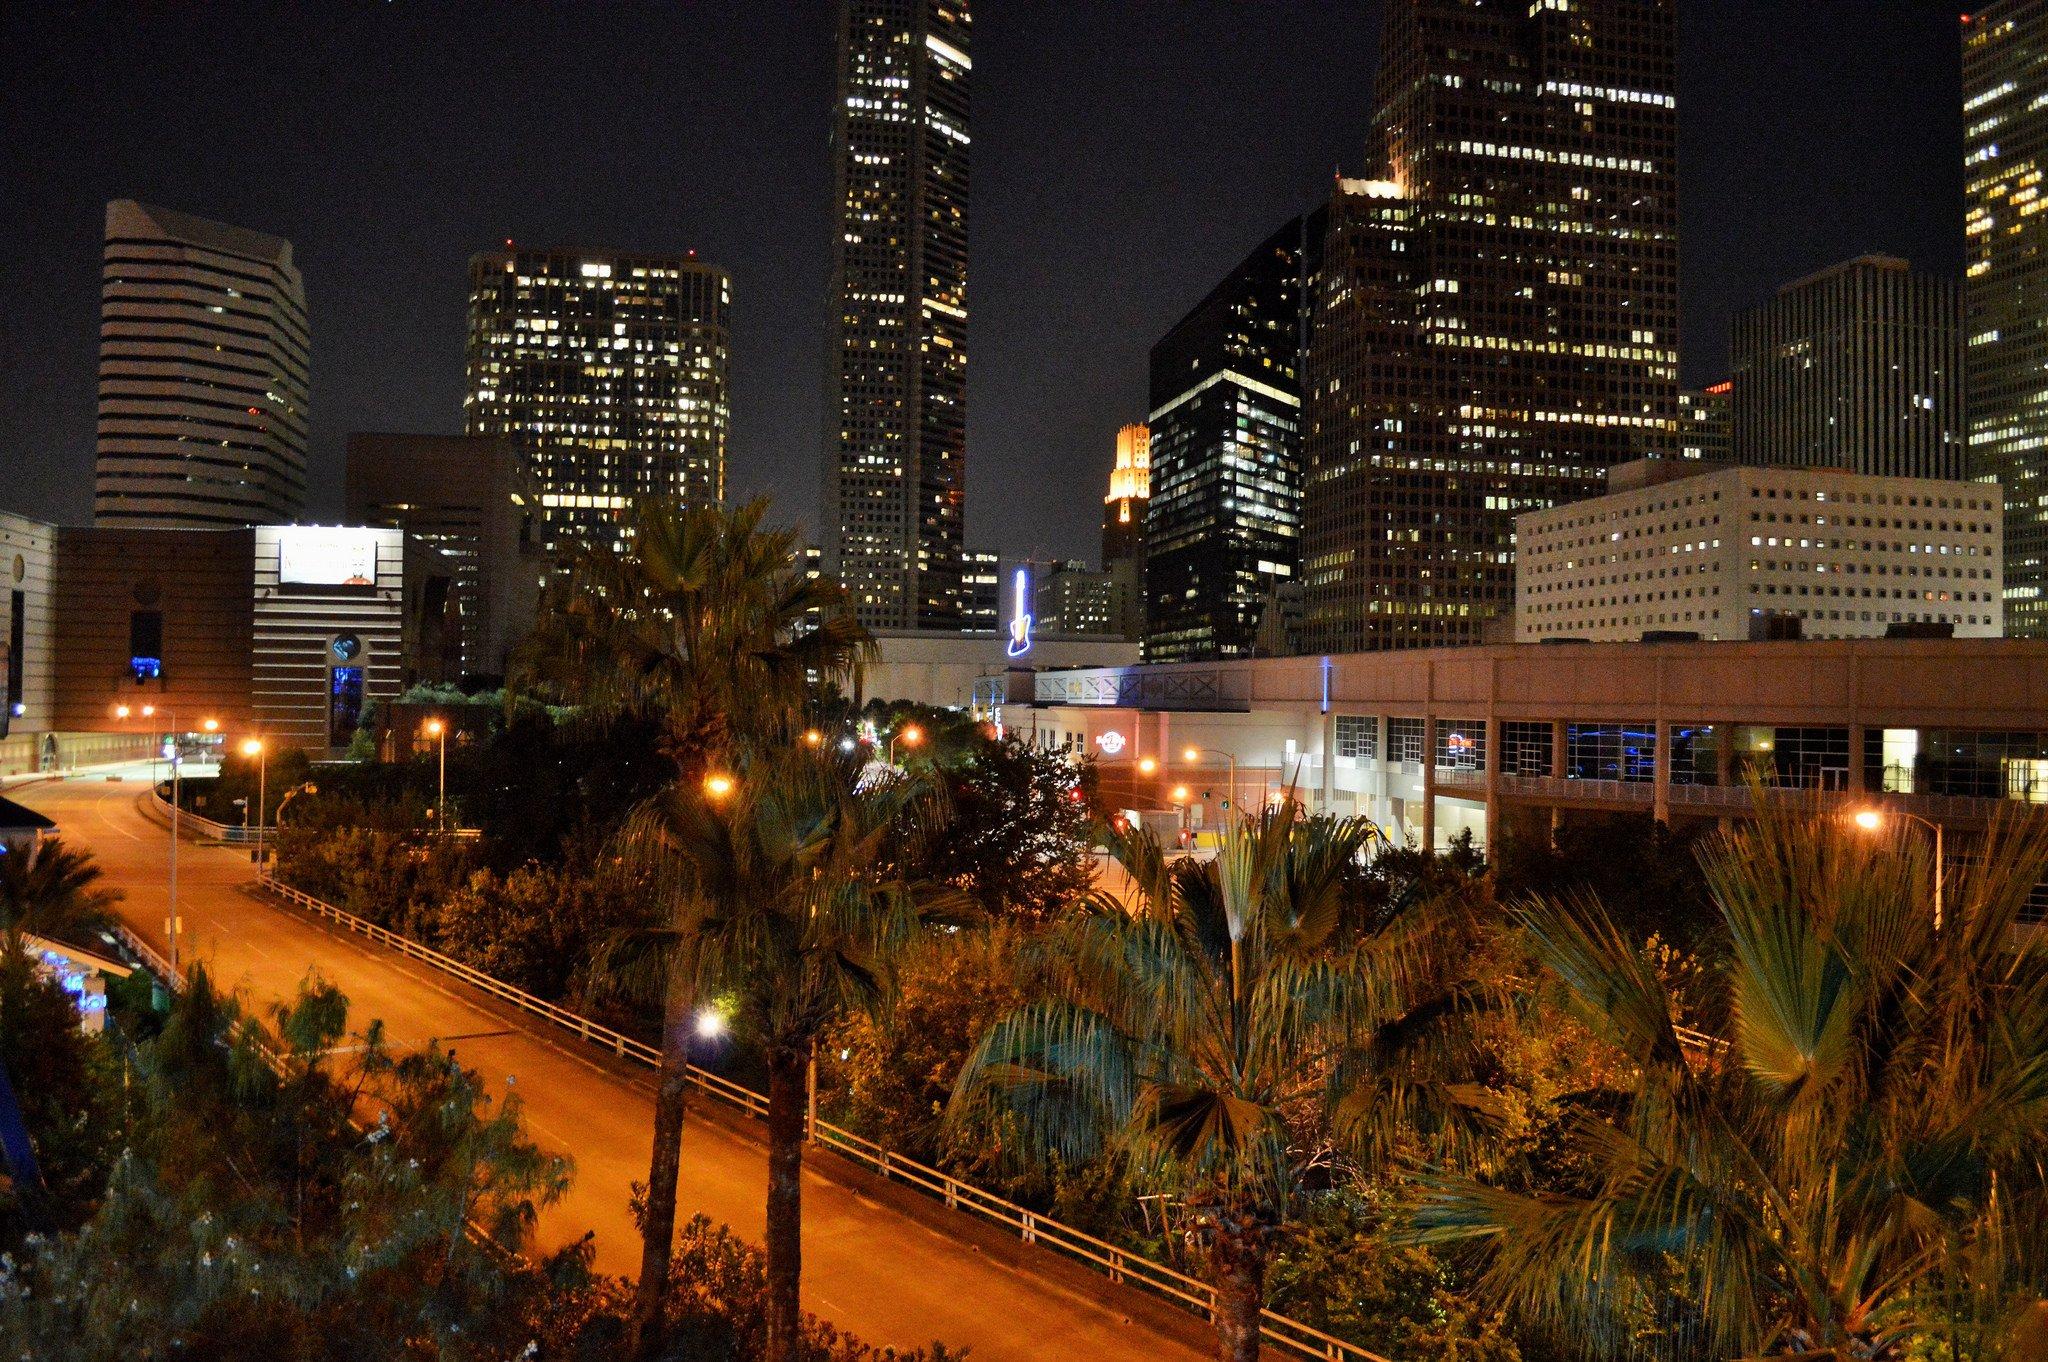 Houston architecture bridges cities City texas Night towers buildings 2048x1362